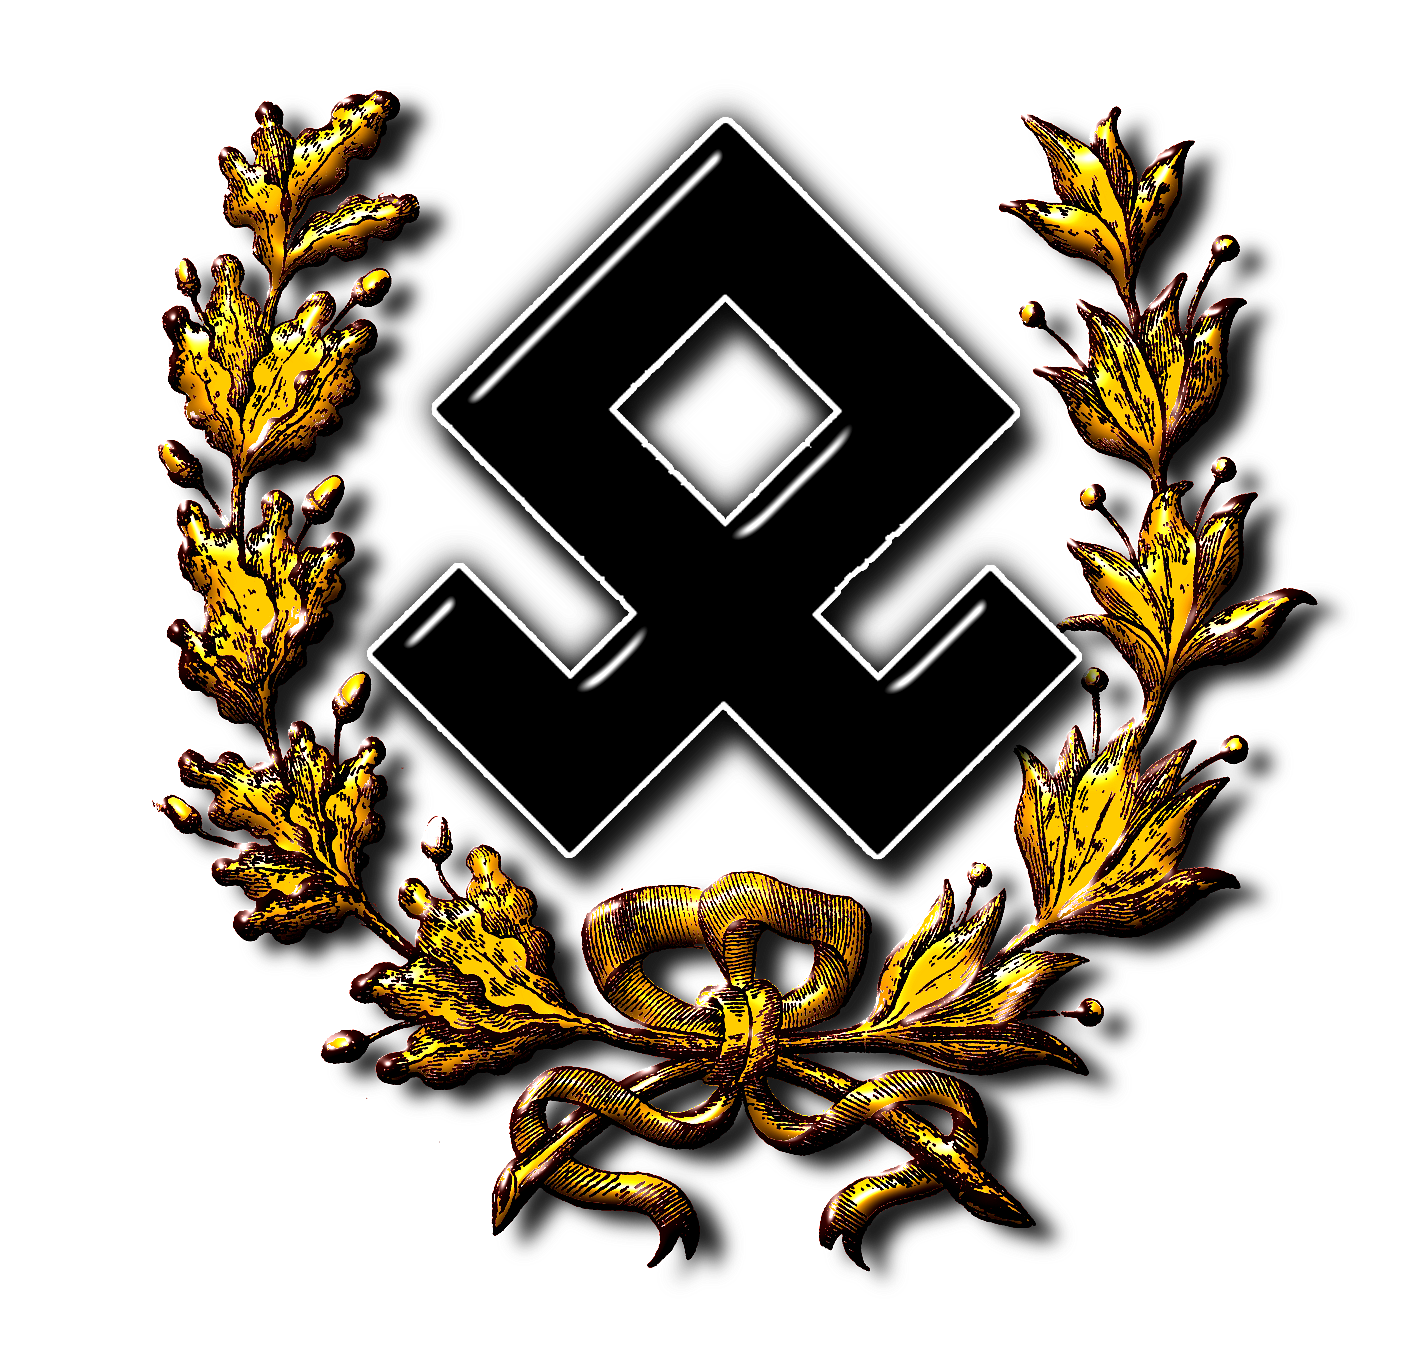 Occult clipart viking runes Rune Magic Magic Occult Reich: